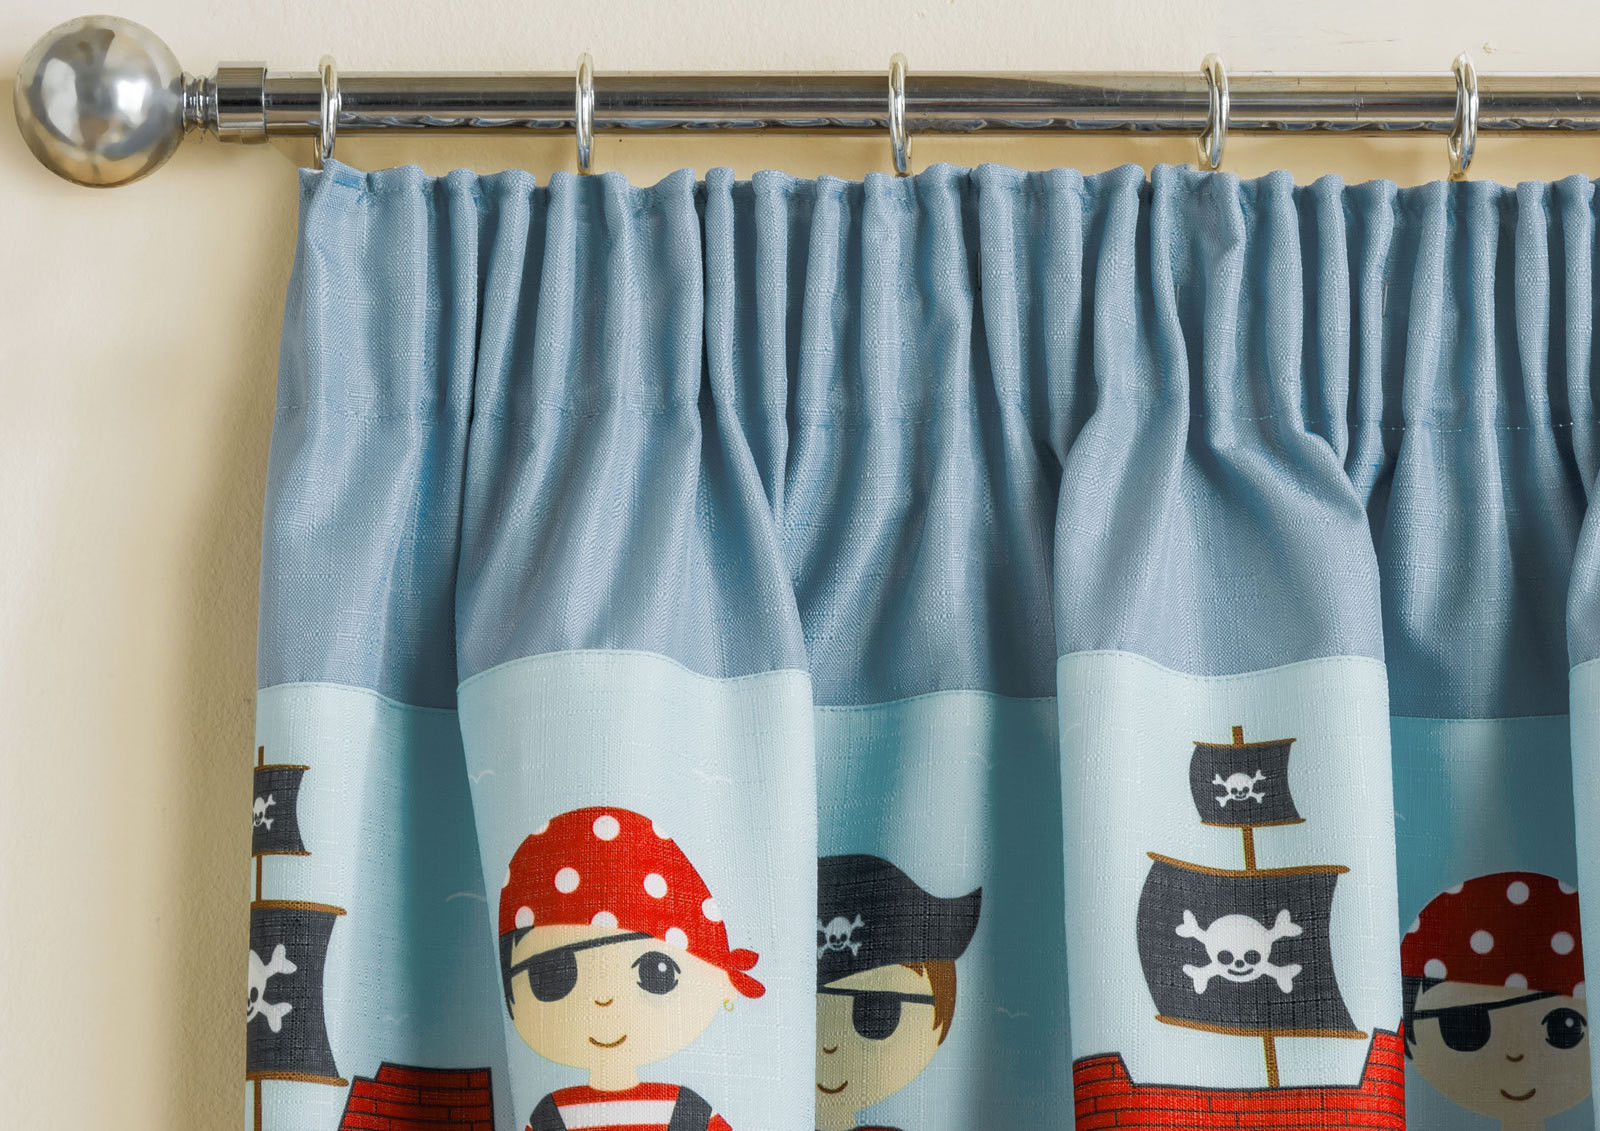 Per bambini pirati tende luce riducono termiche cameretta - Tende per cameretta bambina ...